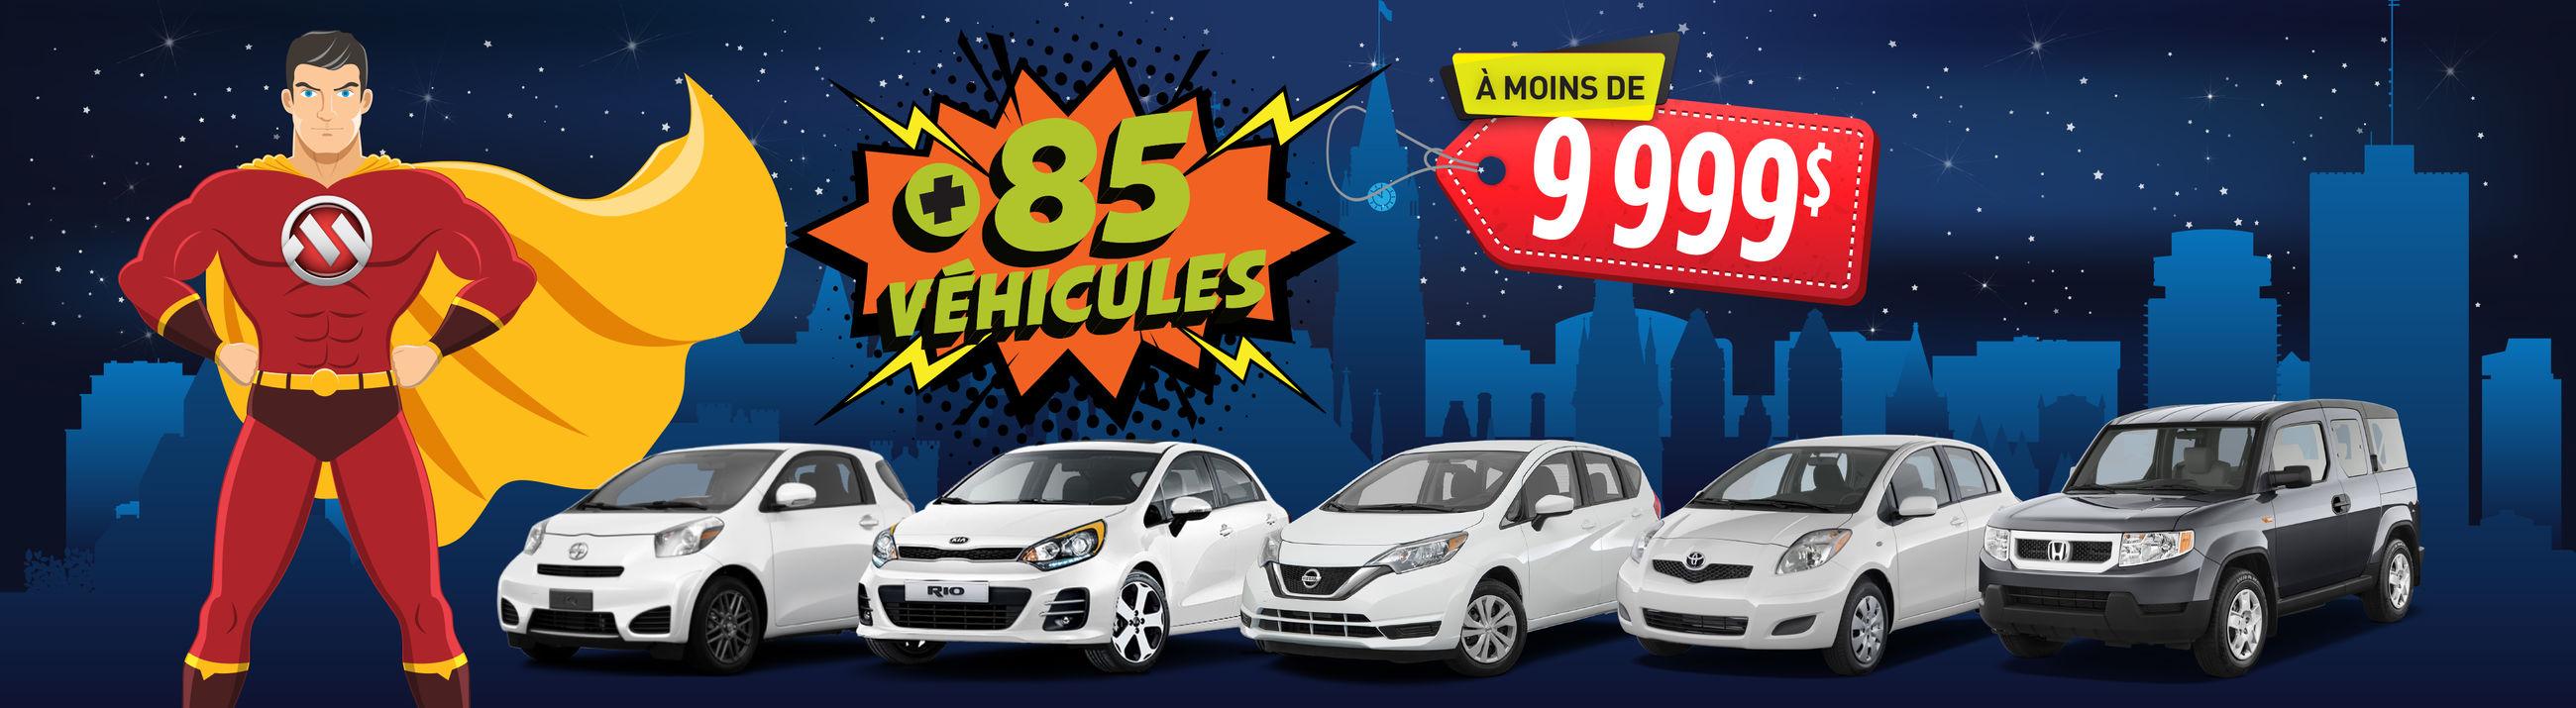 +85 véhicules - 9999$